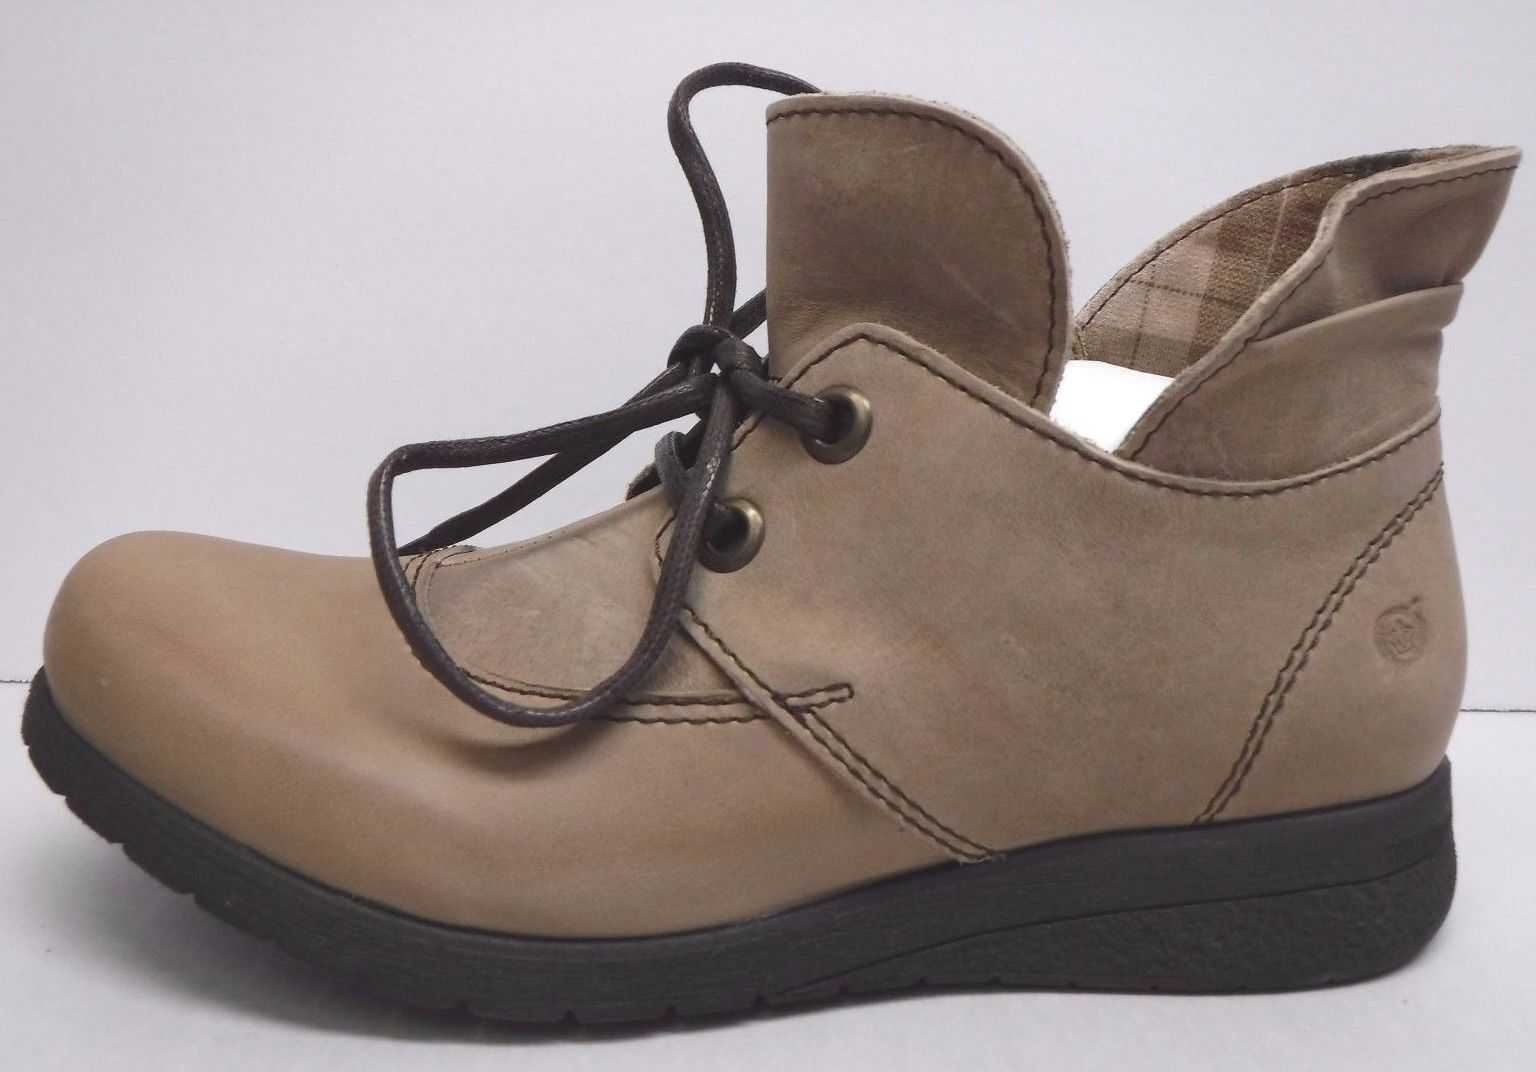 Born Größe 8.5 Taupe Leder Ankle Stiefel NEU Damenschuhe Schuhes